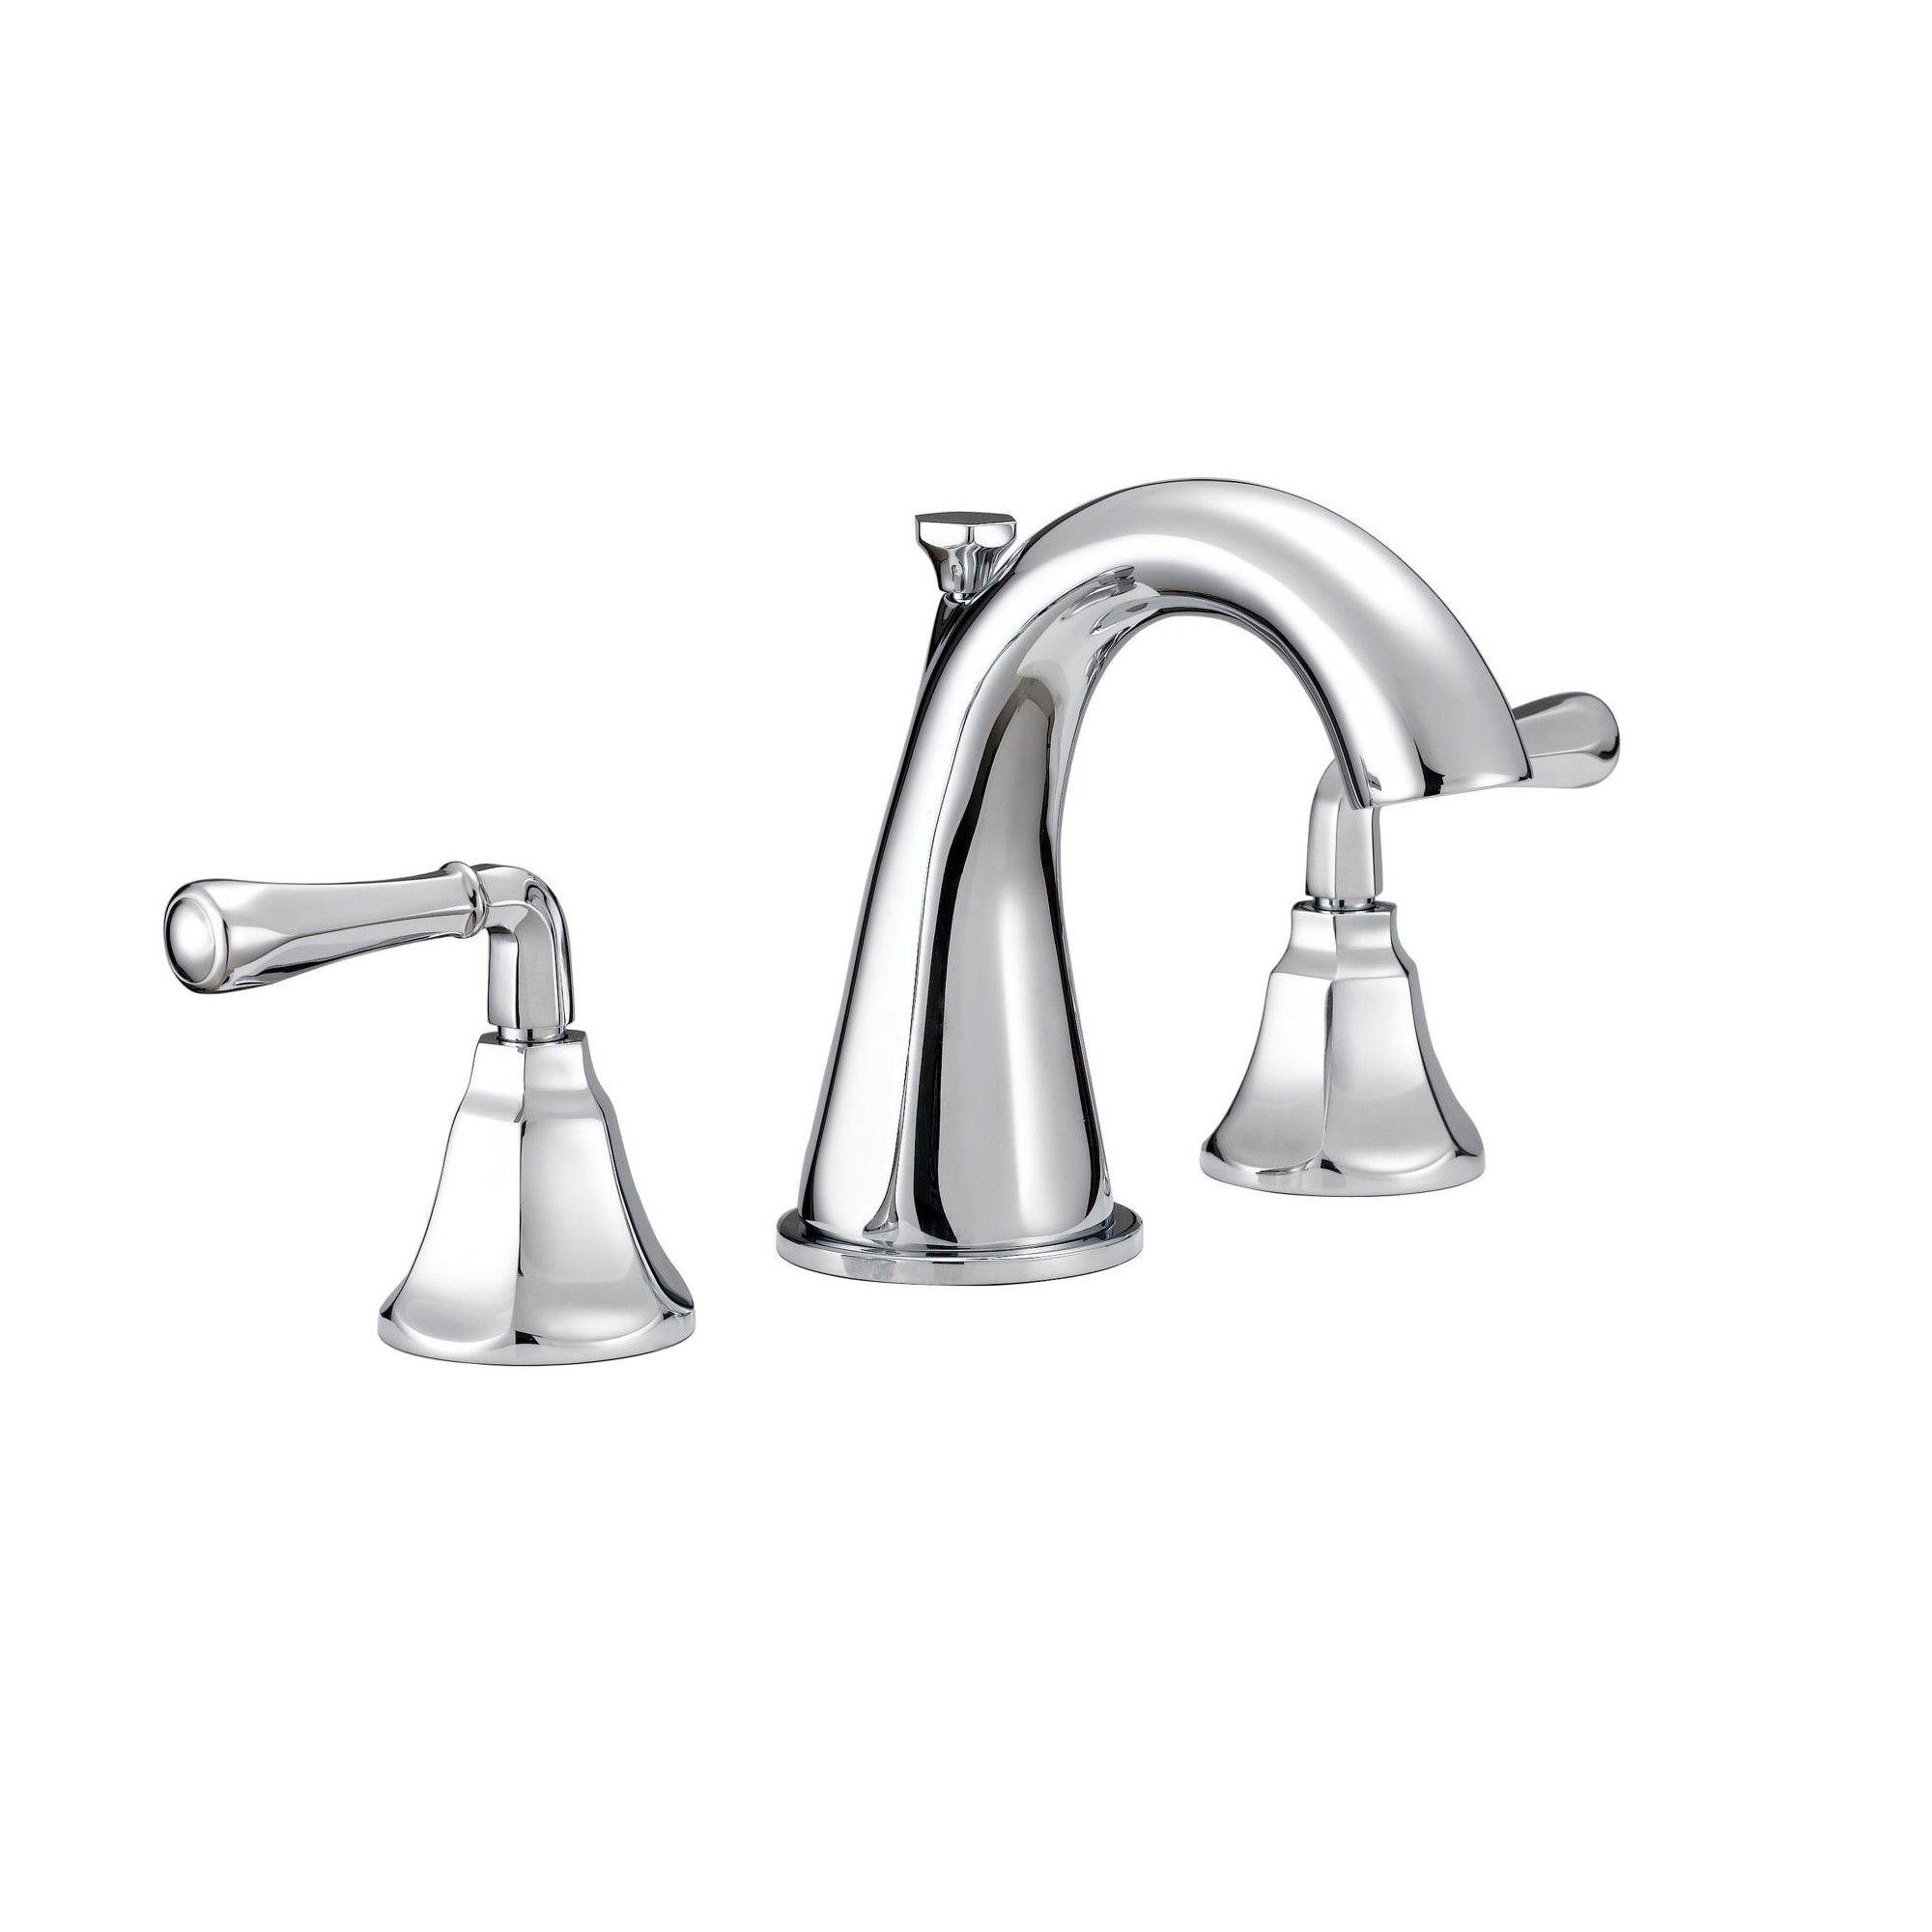 Mirabelle Mirwsckw800 Key West 1 2 Gpm Widespread Bathroom Faucet